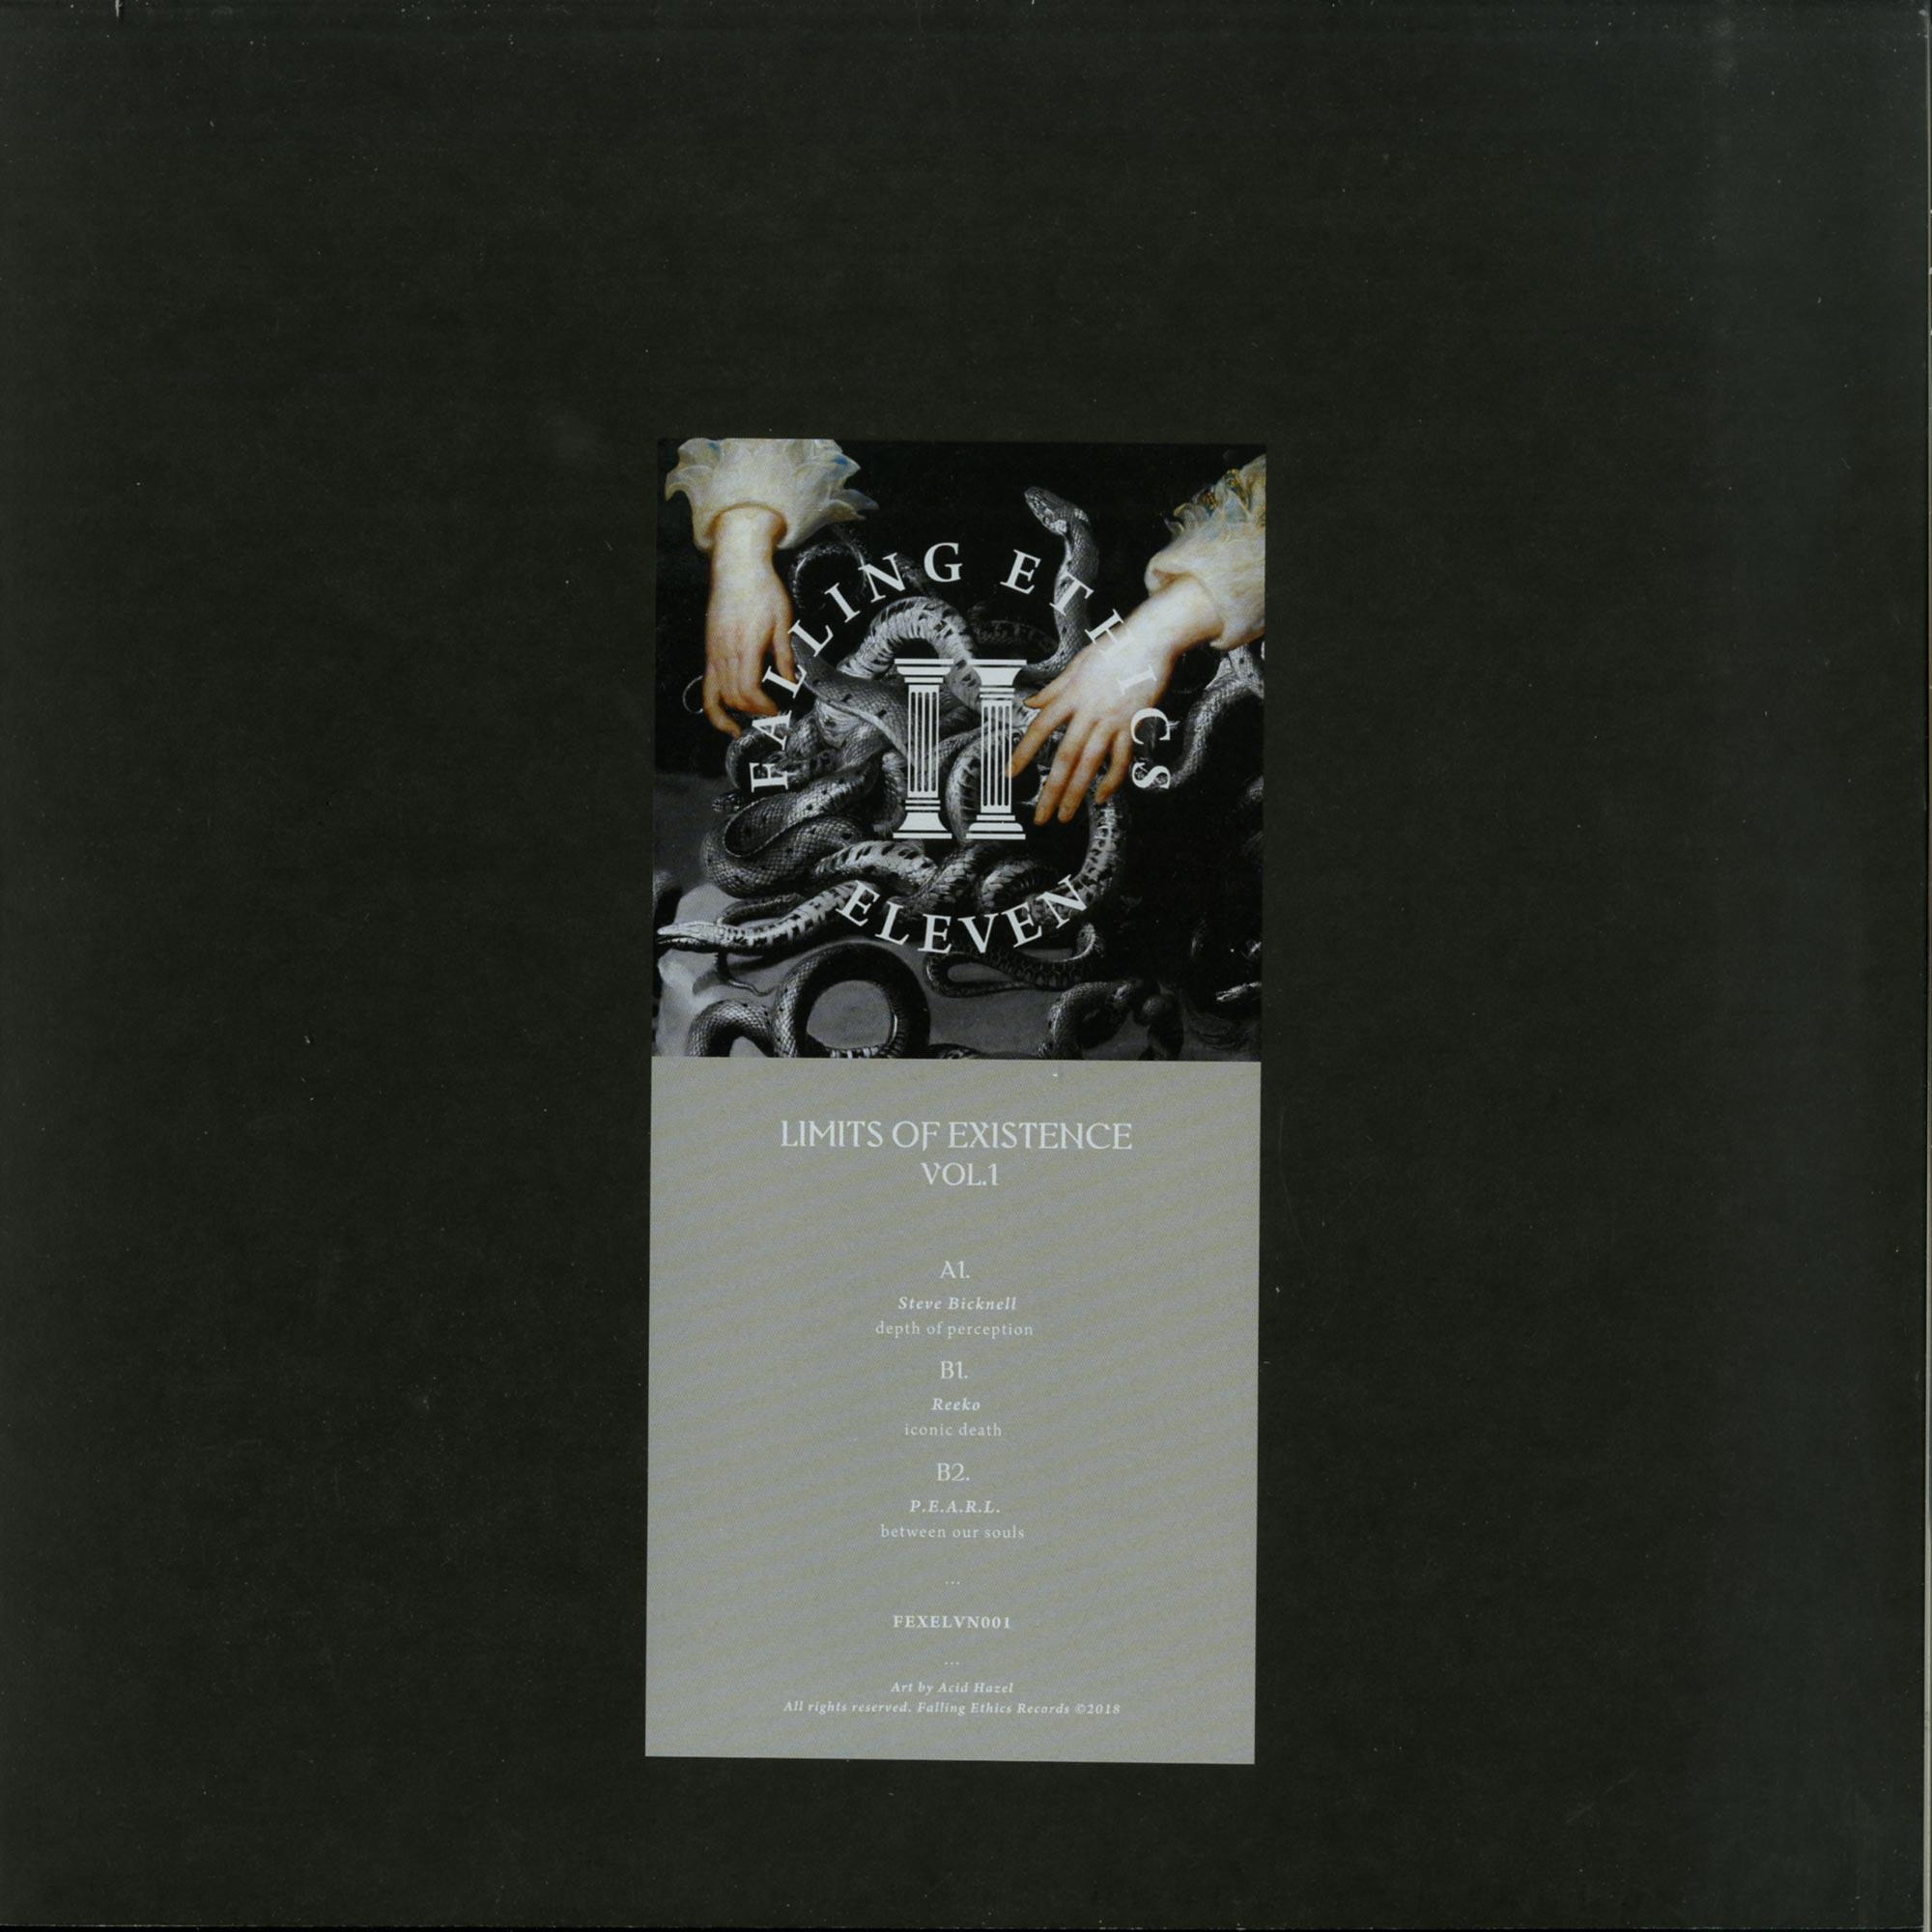 Steve Bicknell / Reeko / P.E.A.R.L. - LIMITS OF EXISTENCE VOL. 1